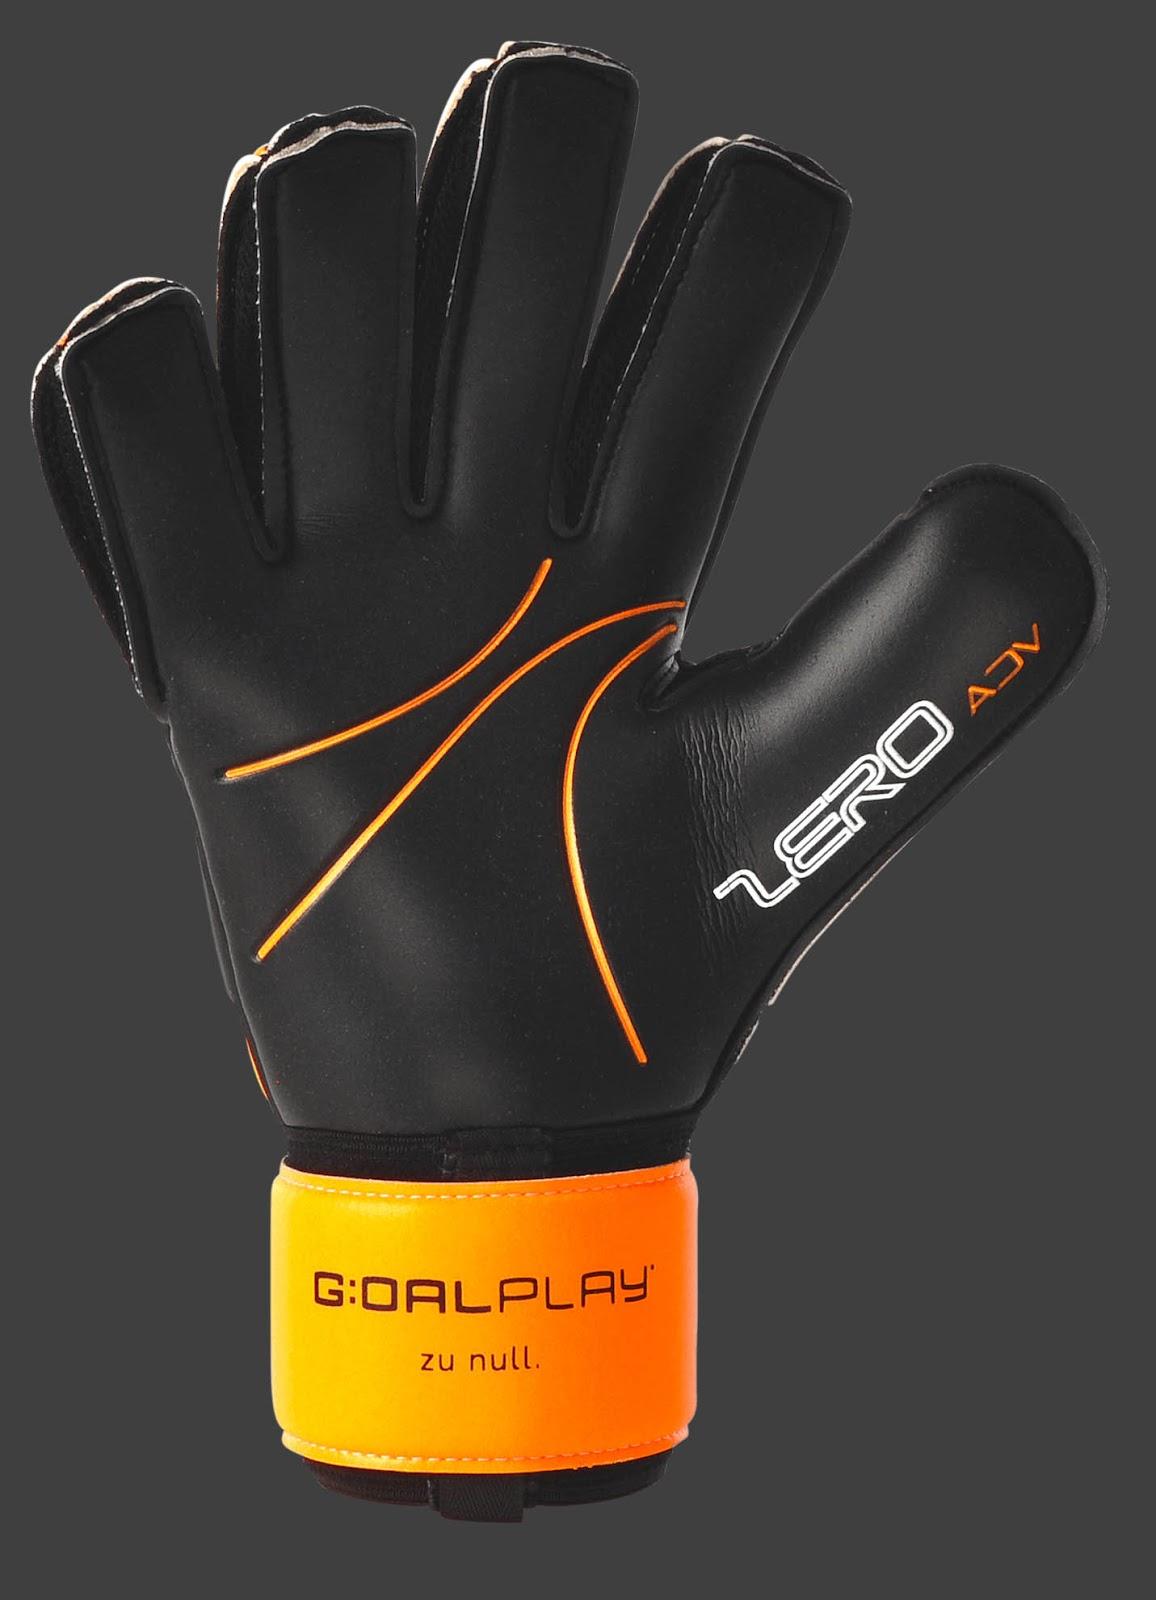 goodbye-adidas-oliver-kahn-launches-goalkeeper-brand-orange-palm